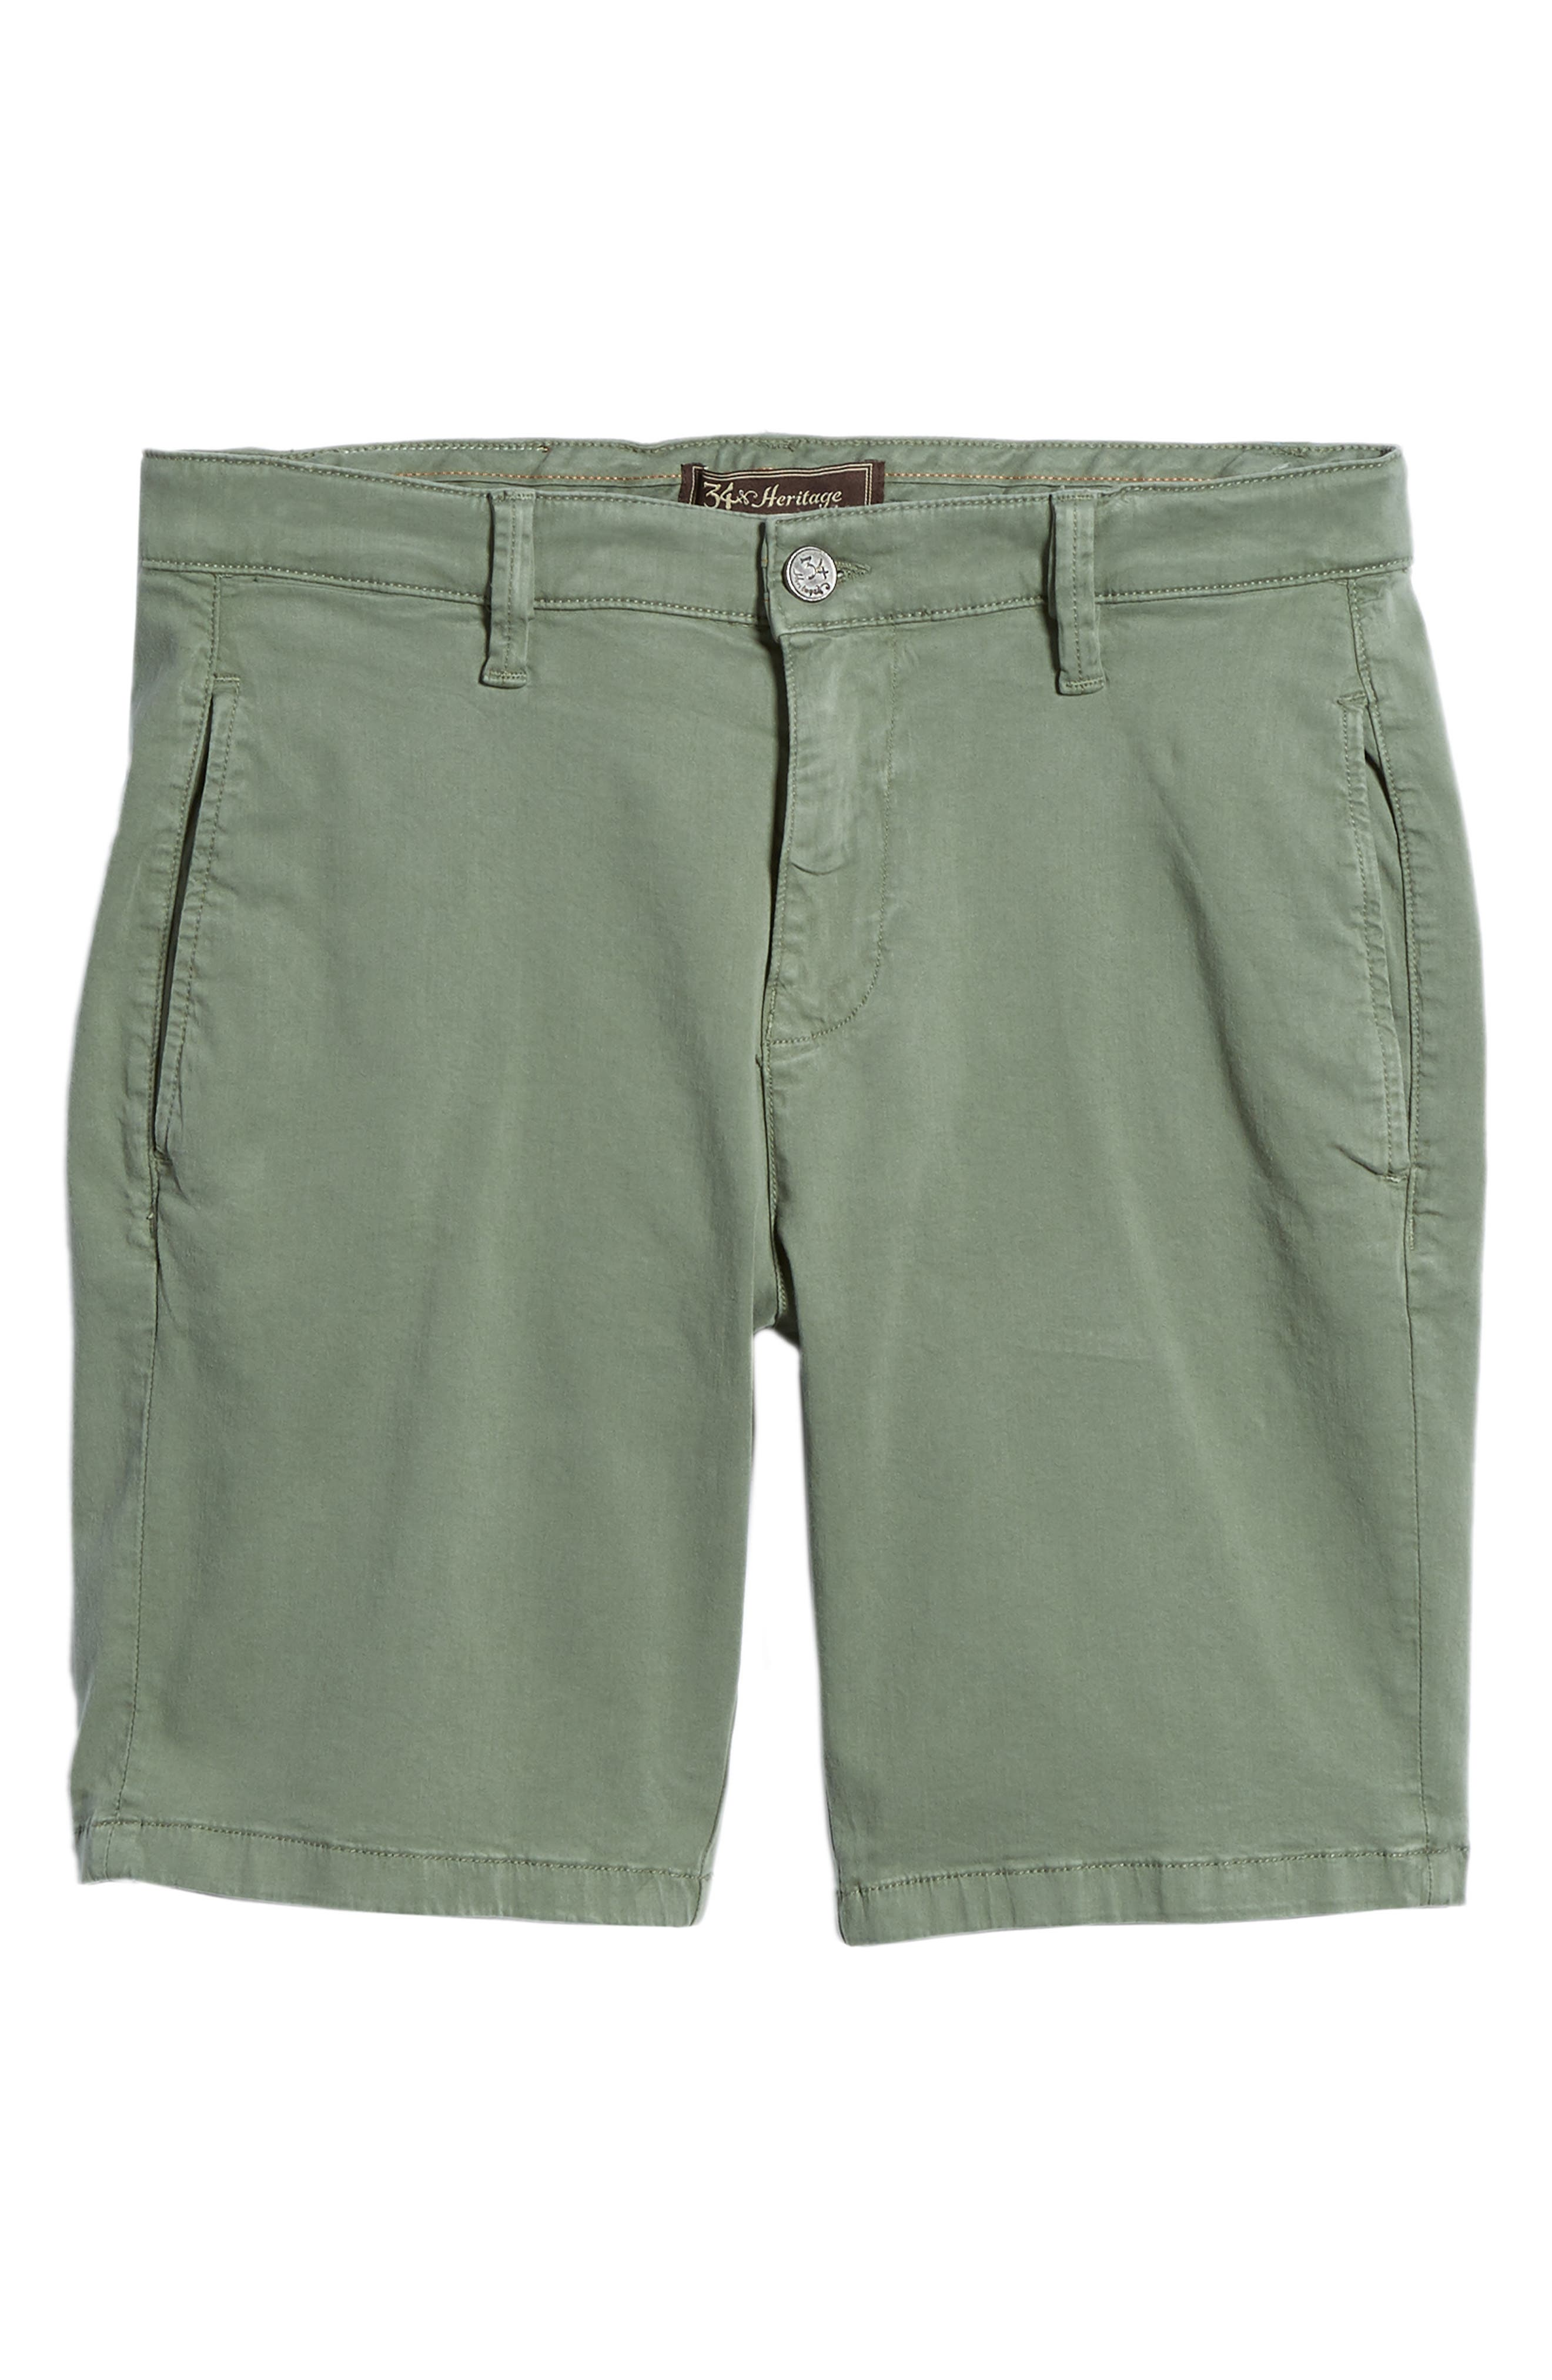 34 HERITAGE,                             Nevada Twill Shorts,                             Alternate thumbnail 6, color,                             MOSS TWILL